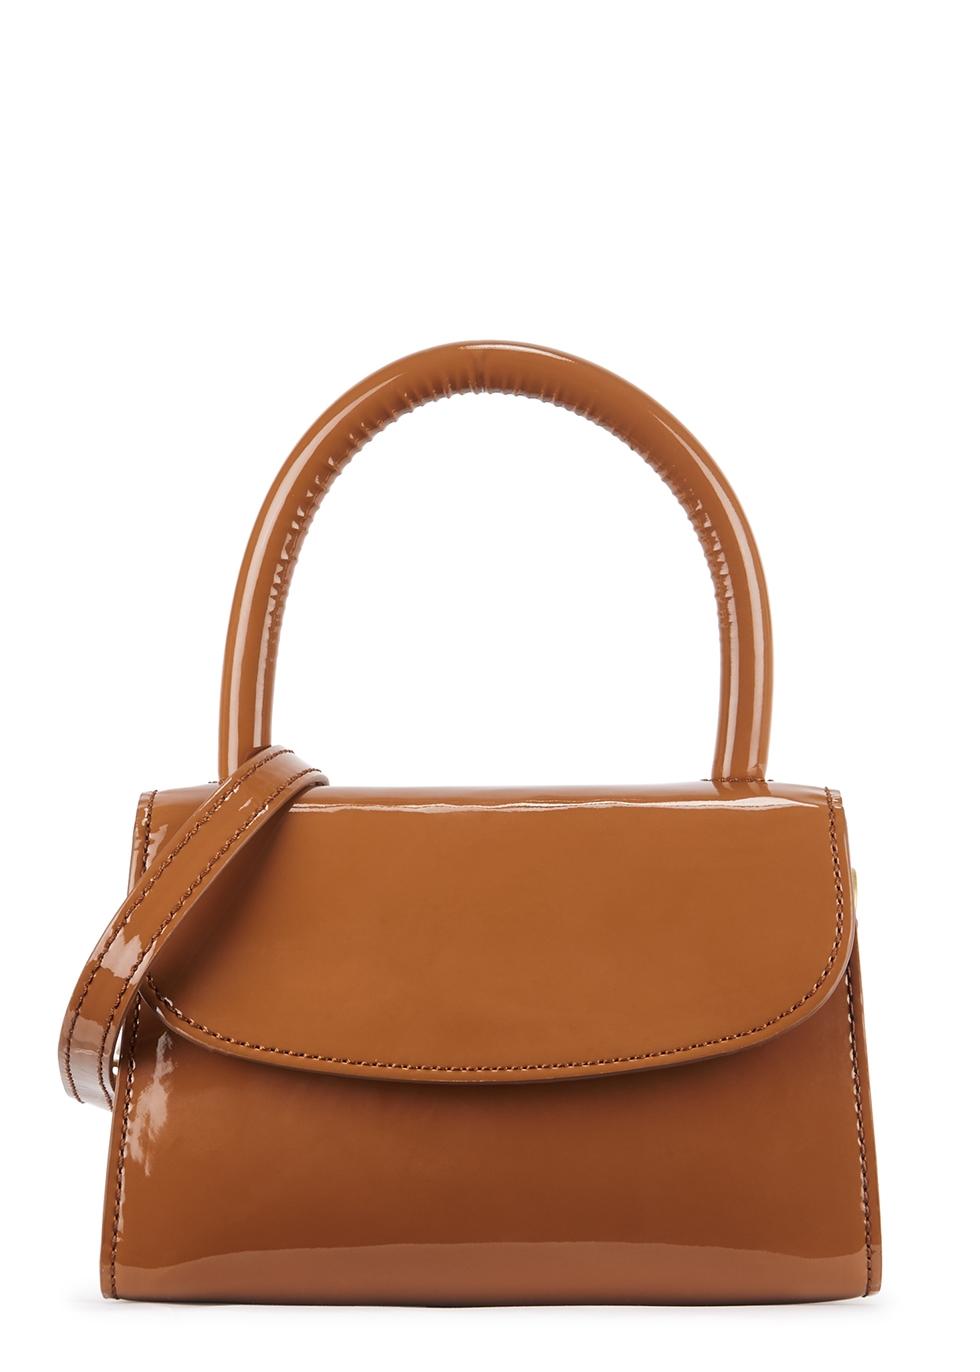 65bbe2a8dd51 Women s Designer Bags